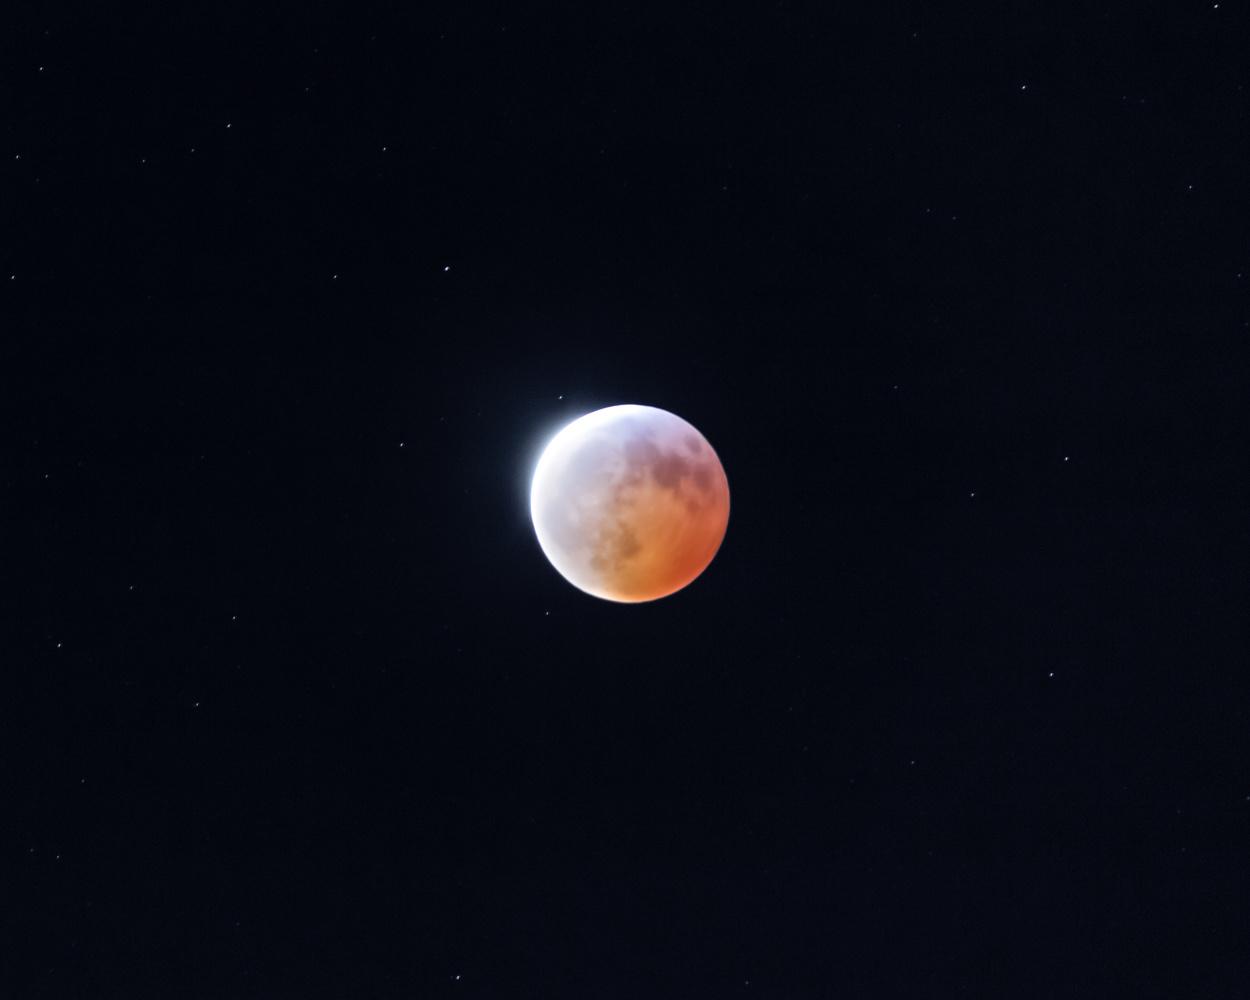 Blood moon by Kunal Mehta